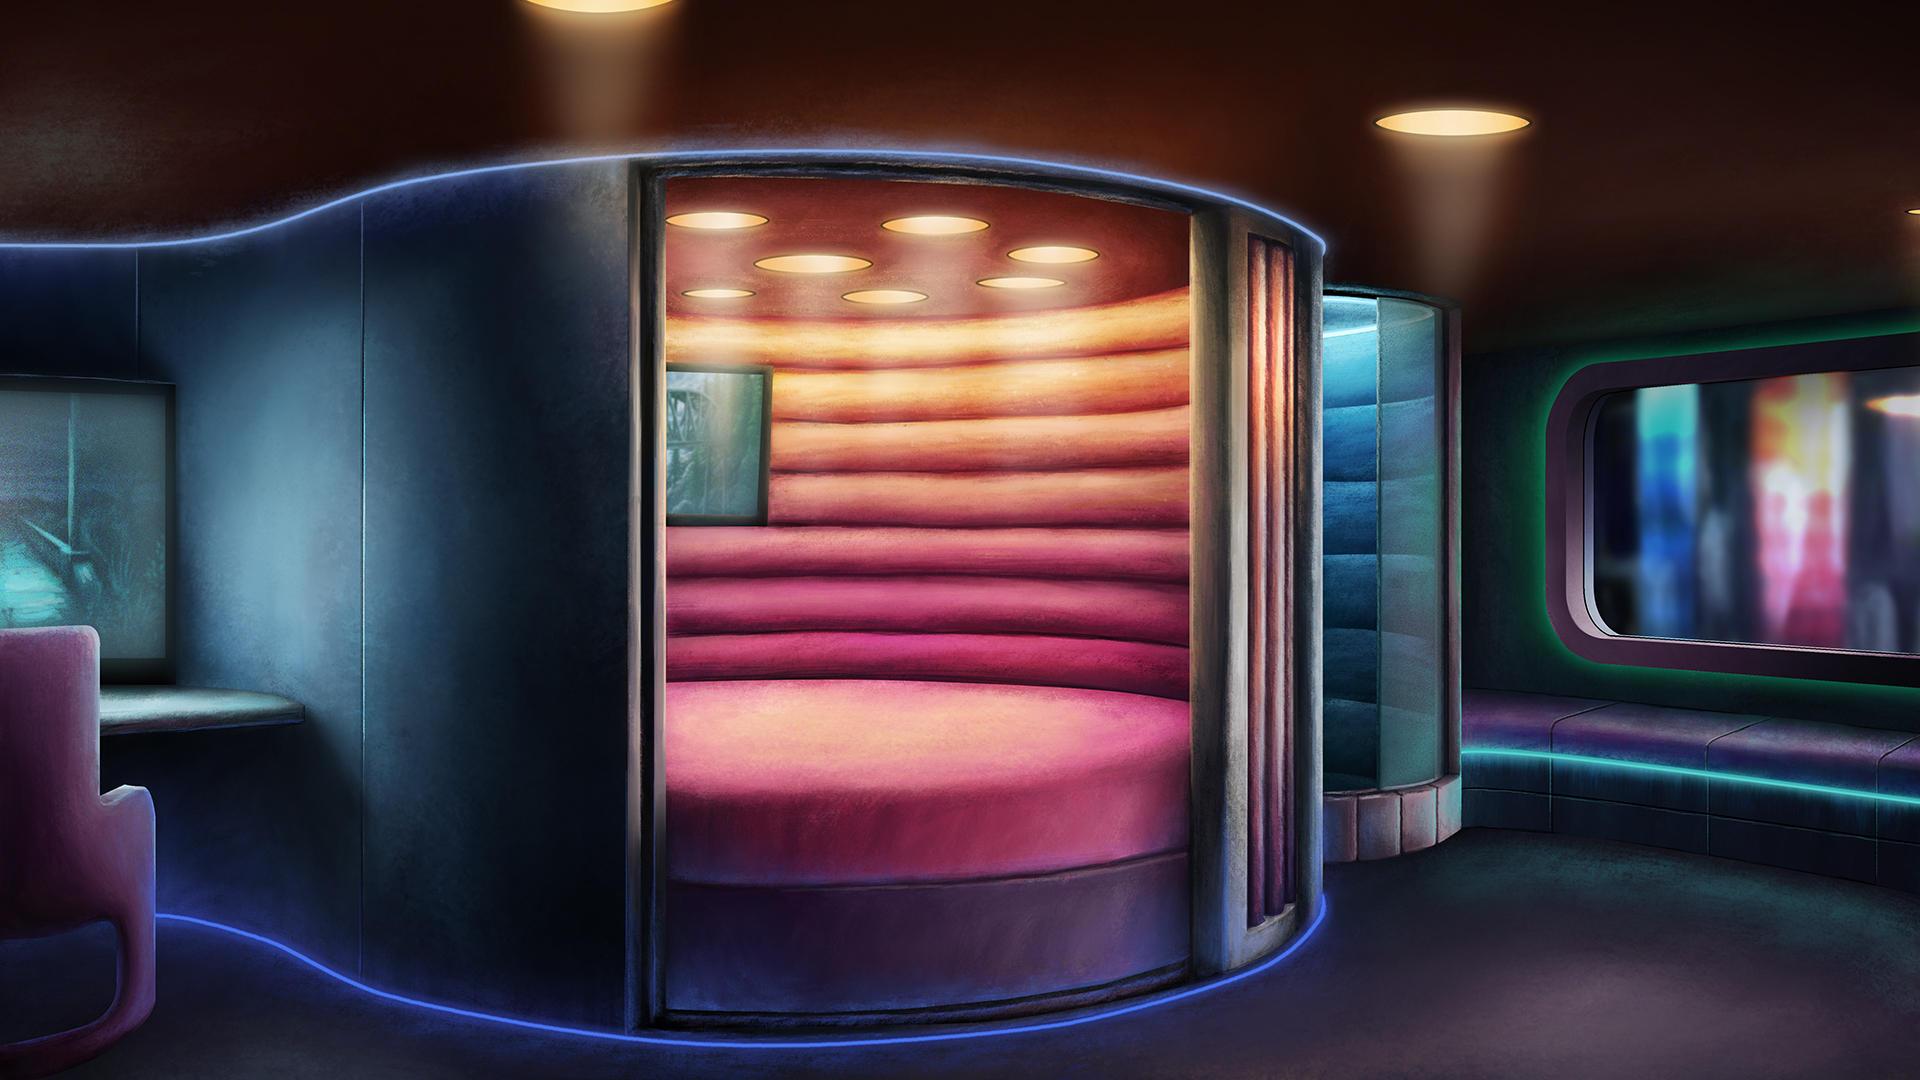 Neon Hotel by Benjamin-the-Fox